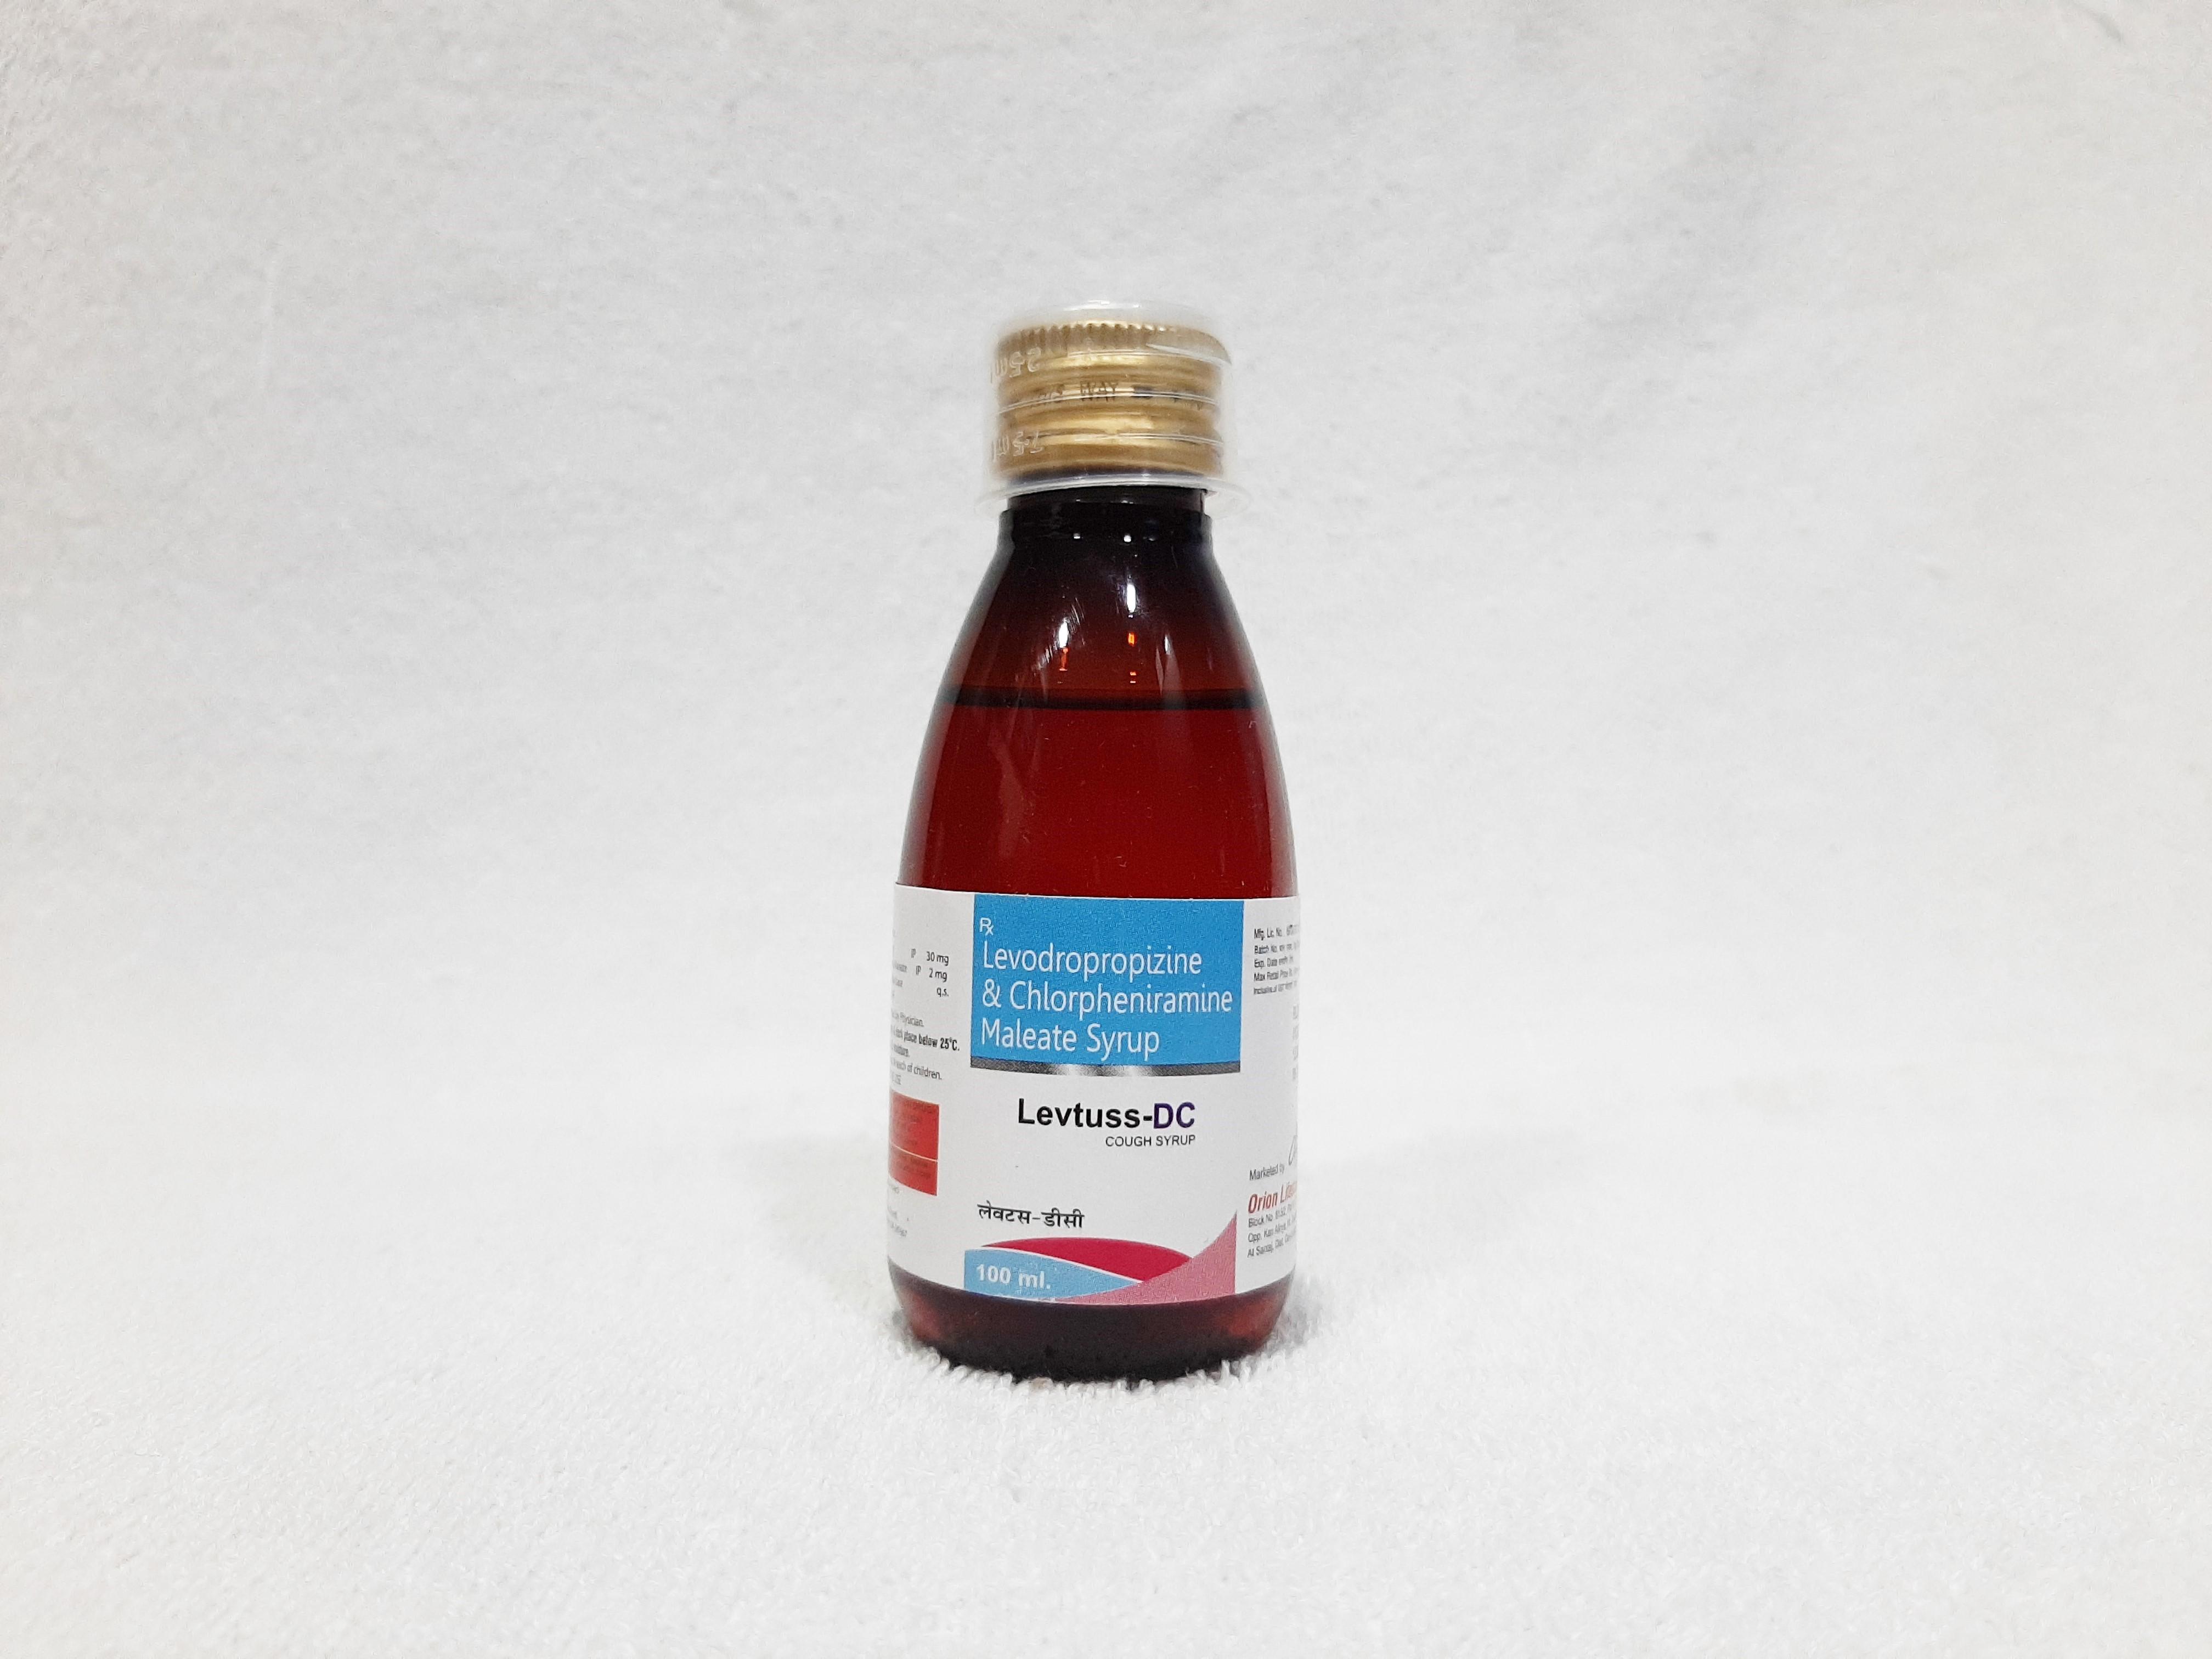 Levodropropazine And Chlorpheniramine Maleate Syrup